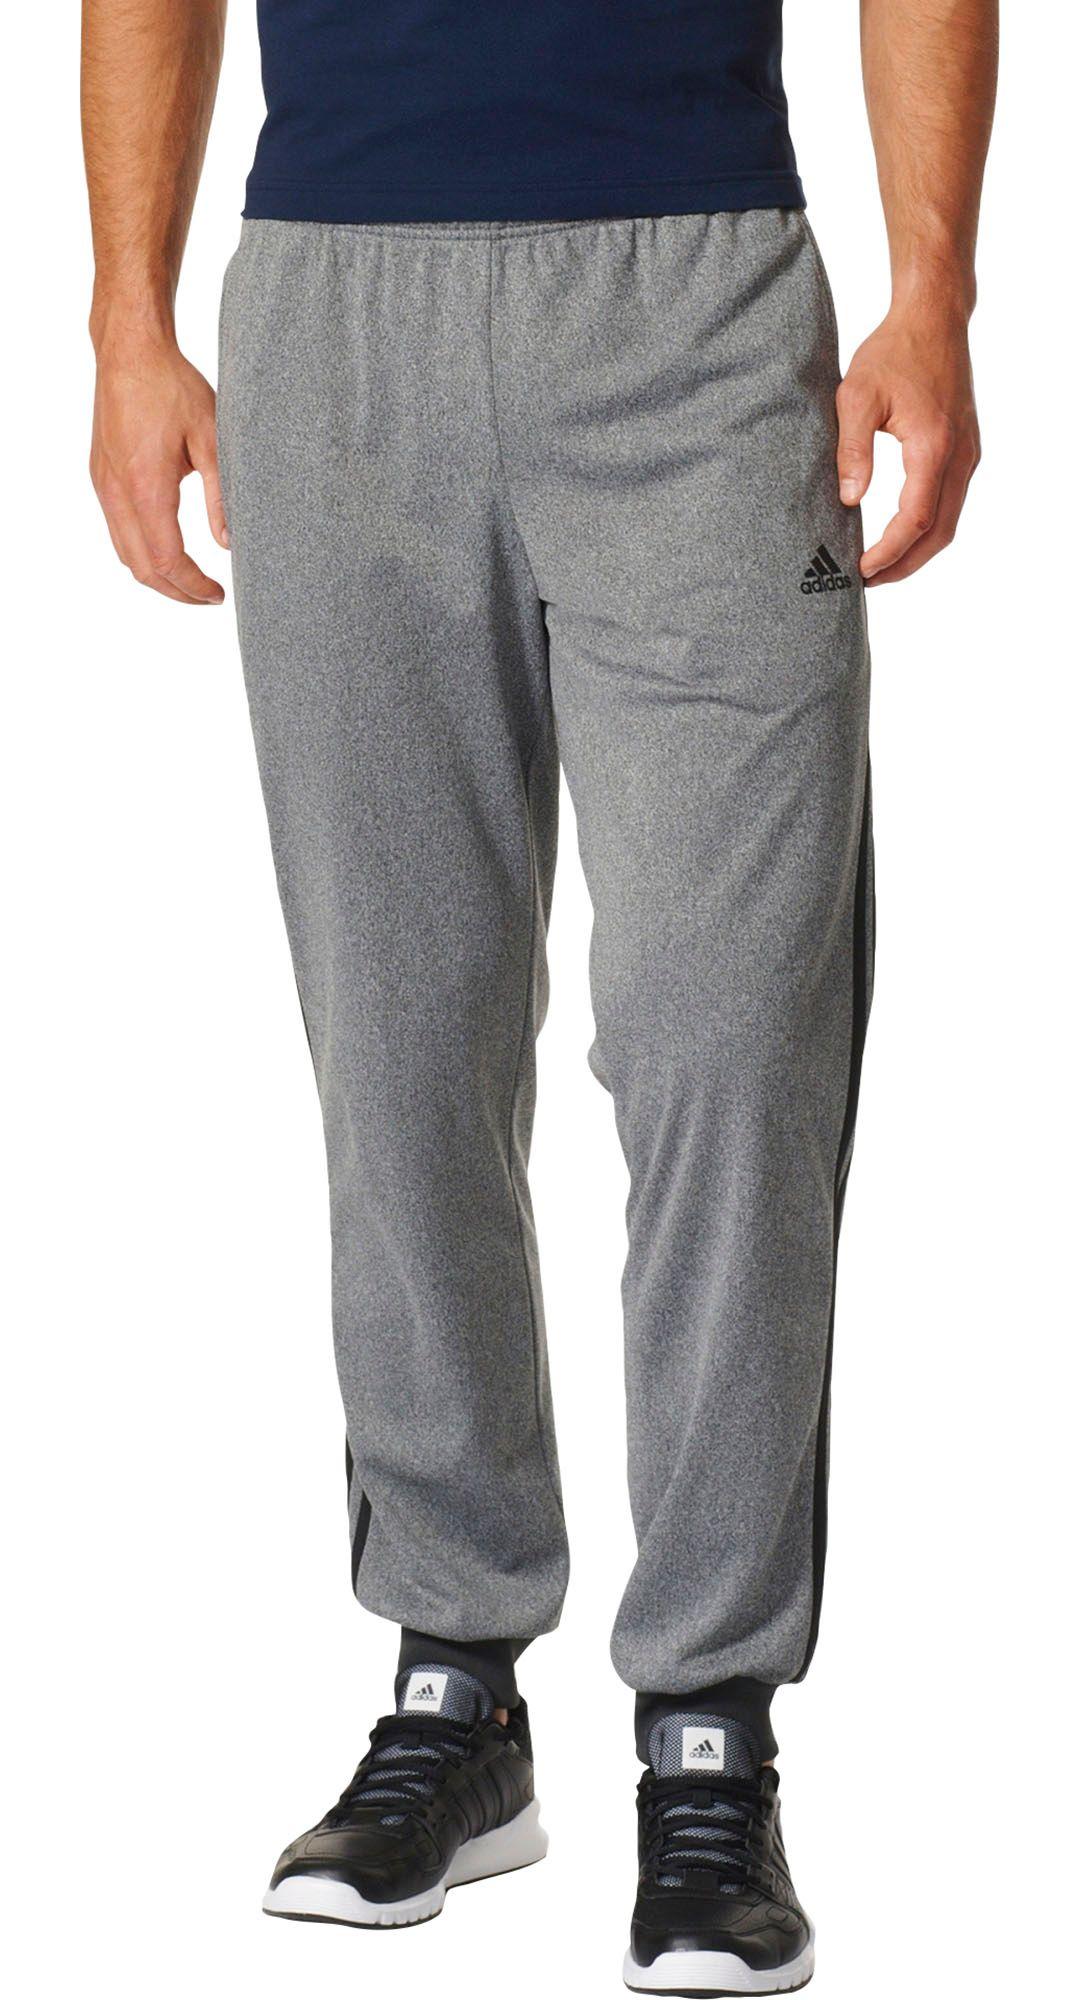 d8df3f4e5 adidas Men's Essentials 3-Stripes Jogger | DICK'S Sporting Goods